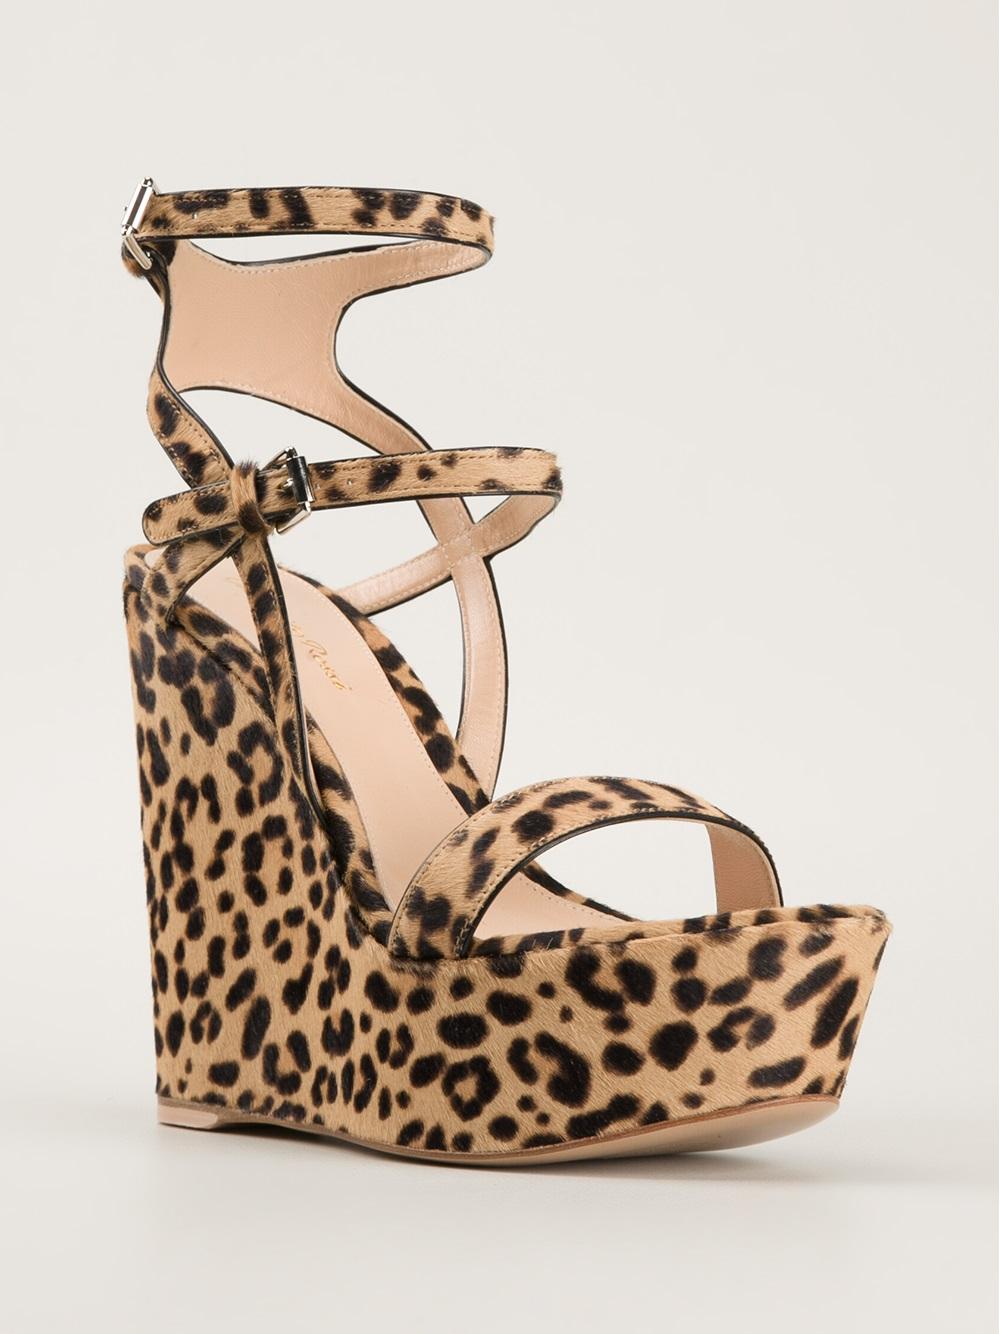 3dd9b95ad Gianvito Rossi Leopard Print Wedge Sandals - Lyst